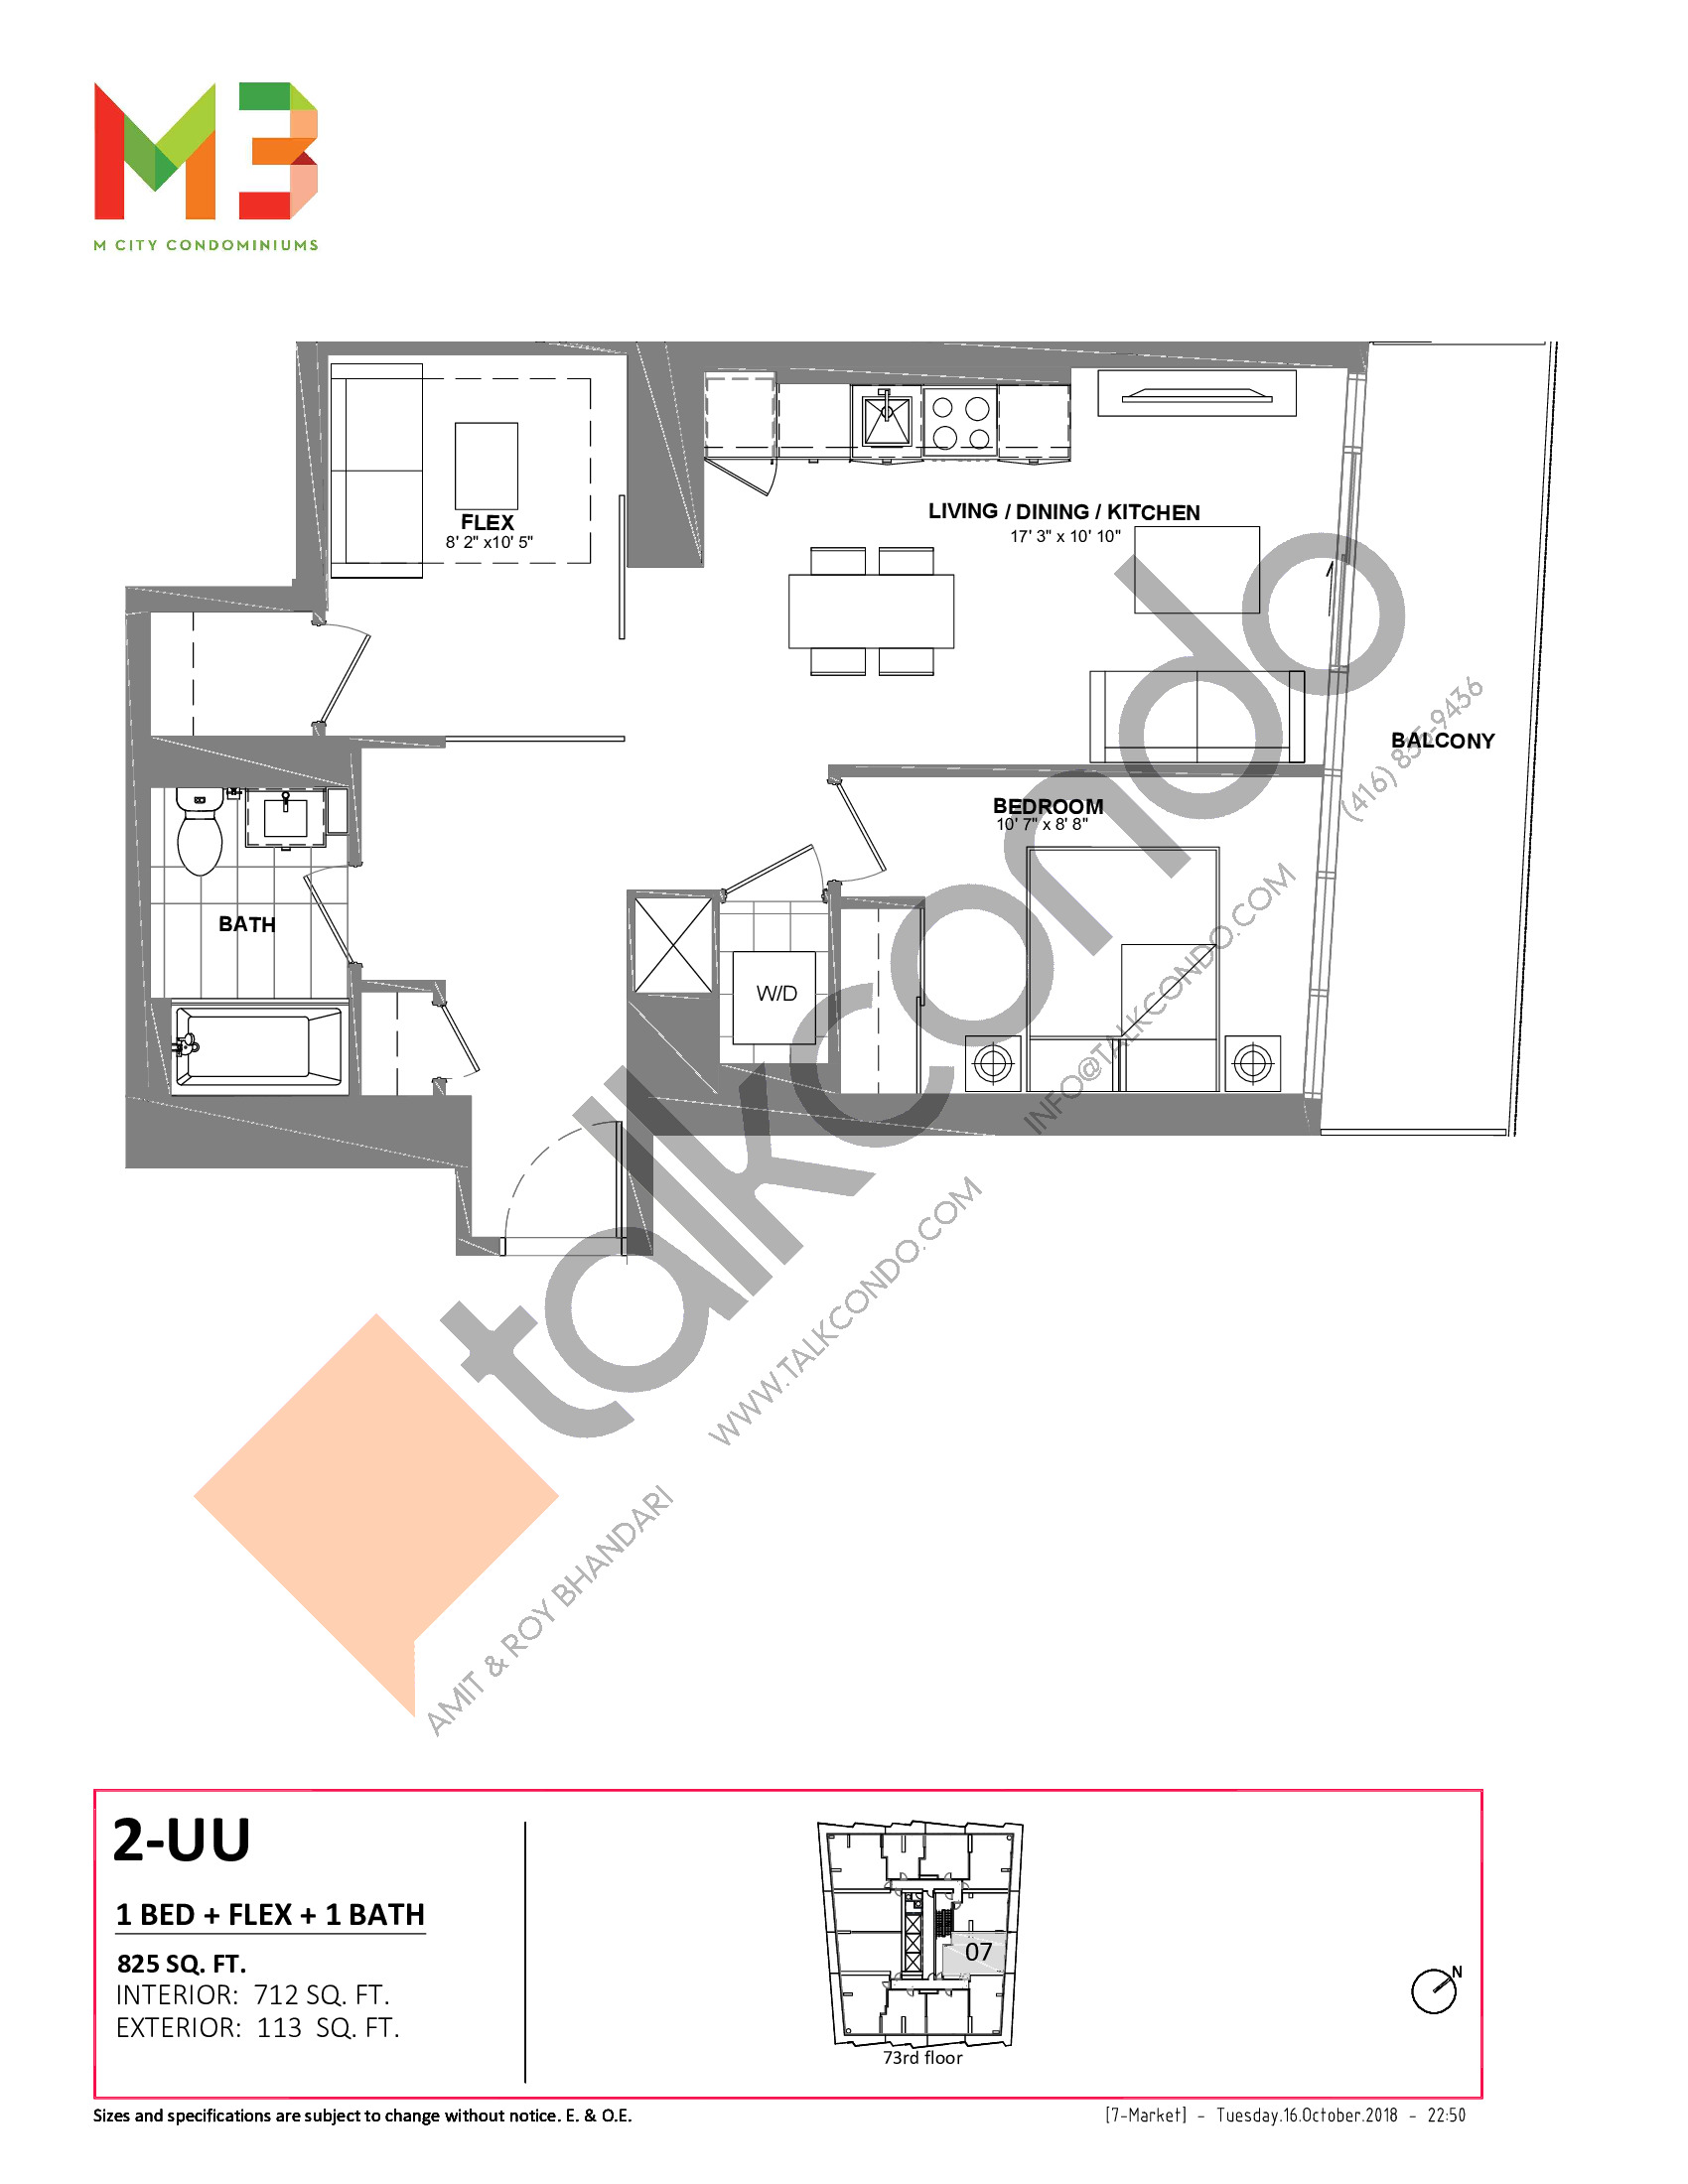 2-UU Floor Plan at M3 Condos - 712 sq.ft